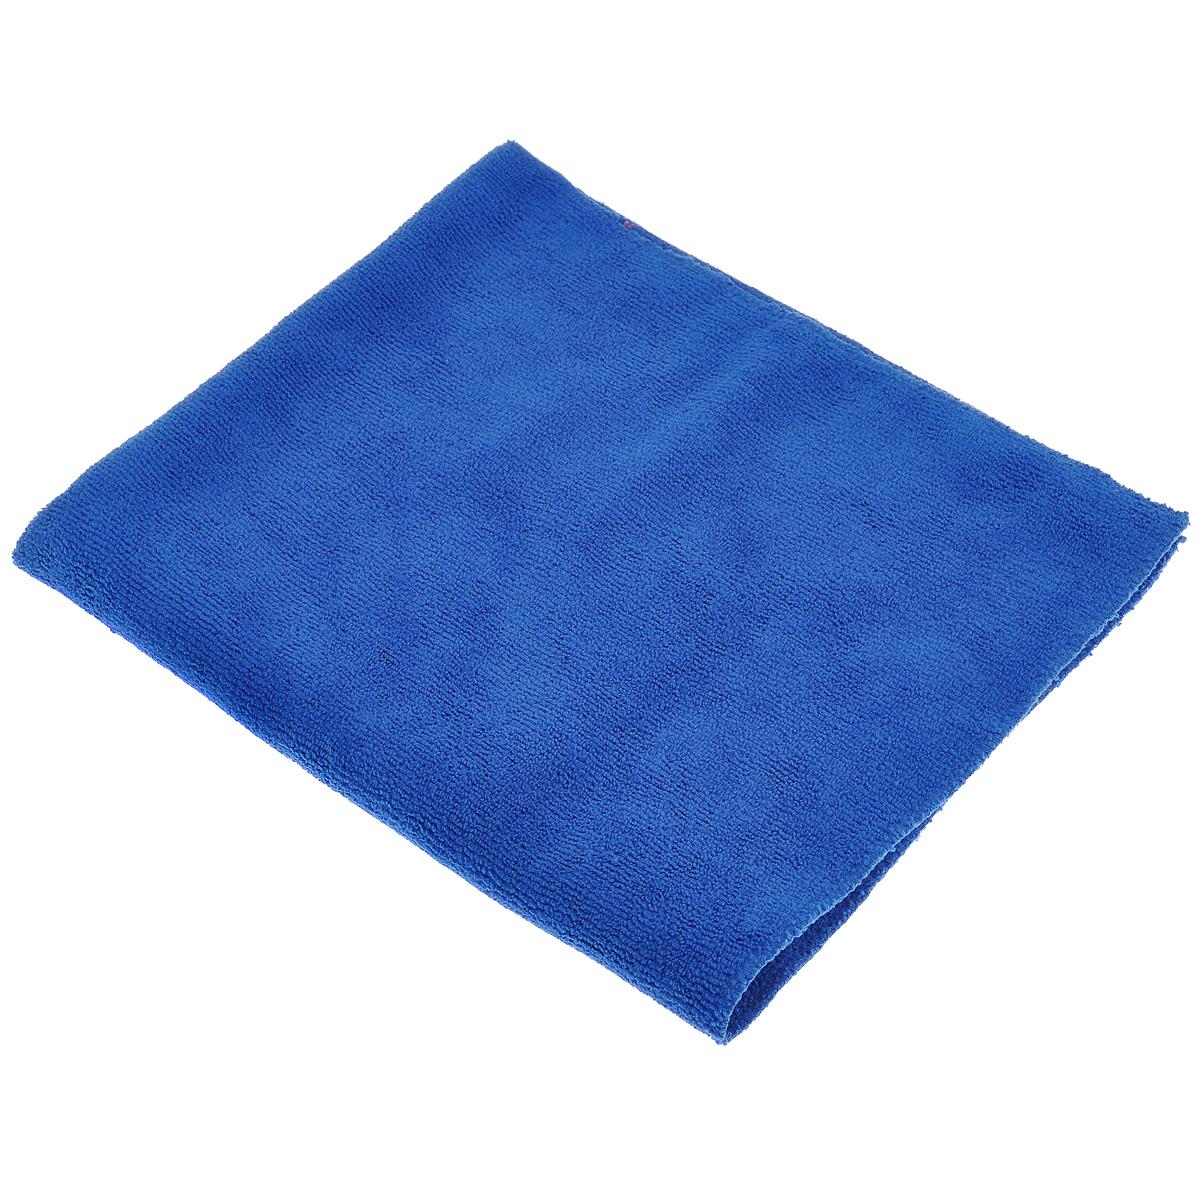 "Тряпка для пола ""Eva"", цвет: синий, 50 х 60 см"